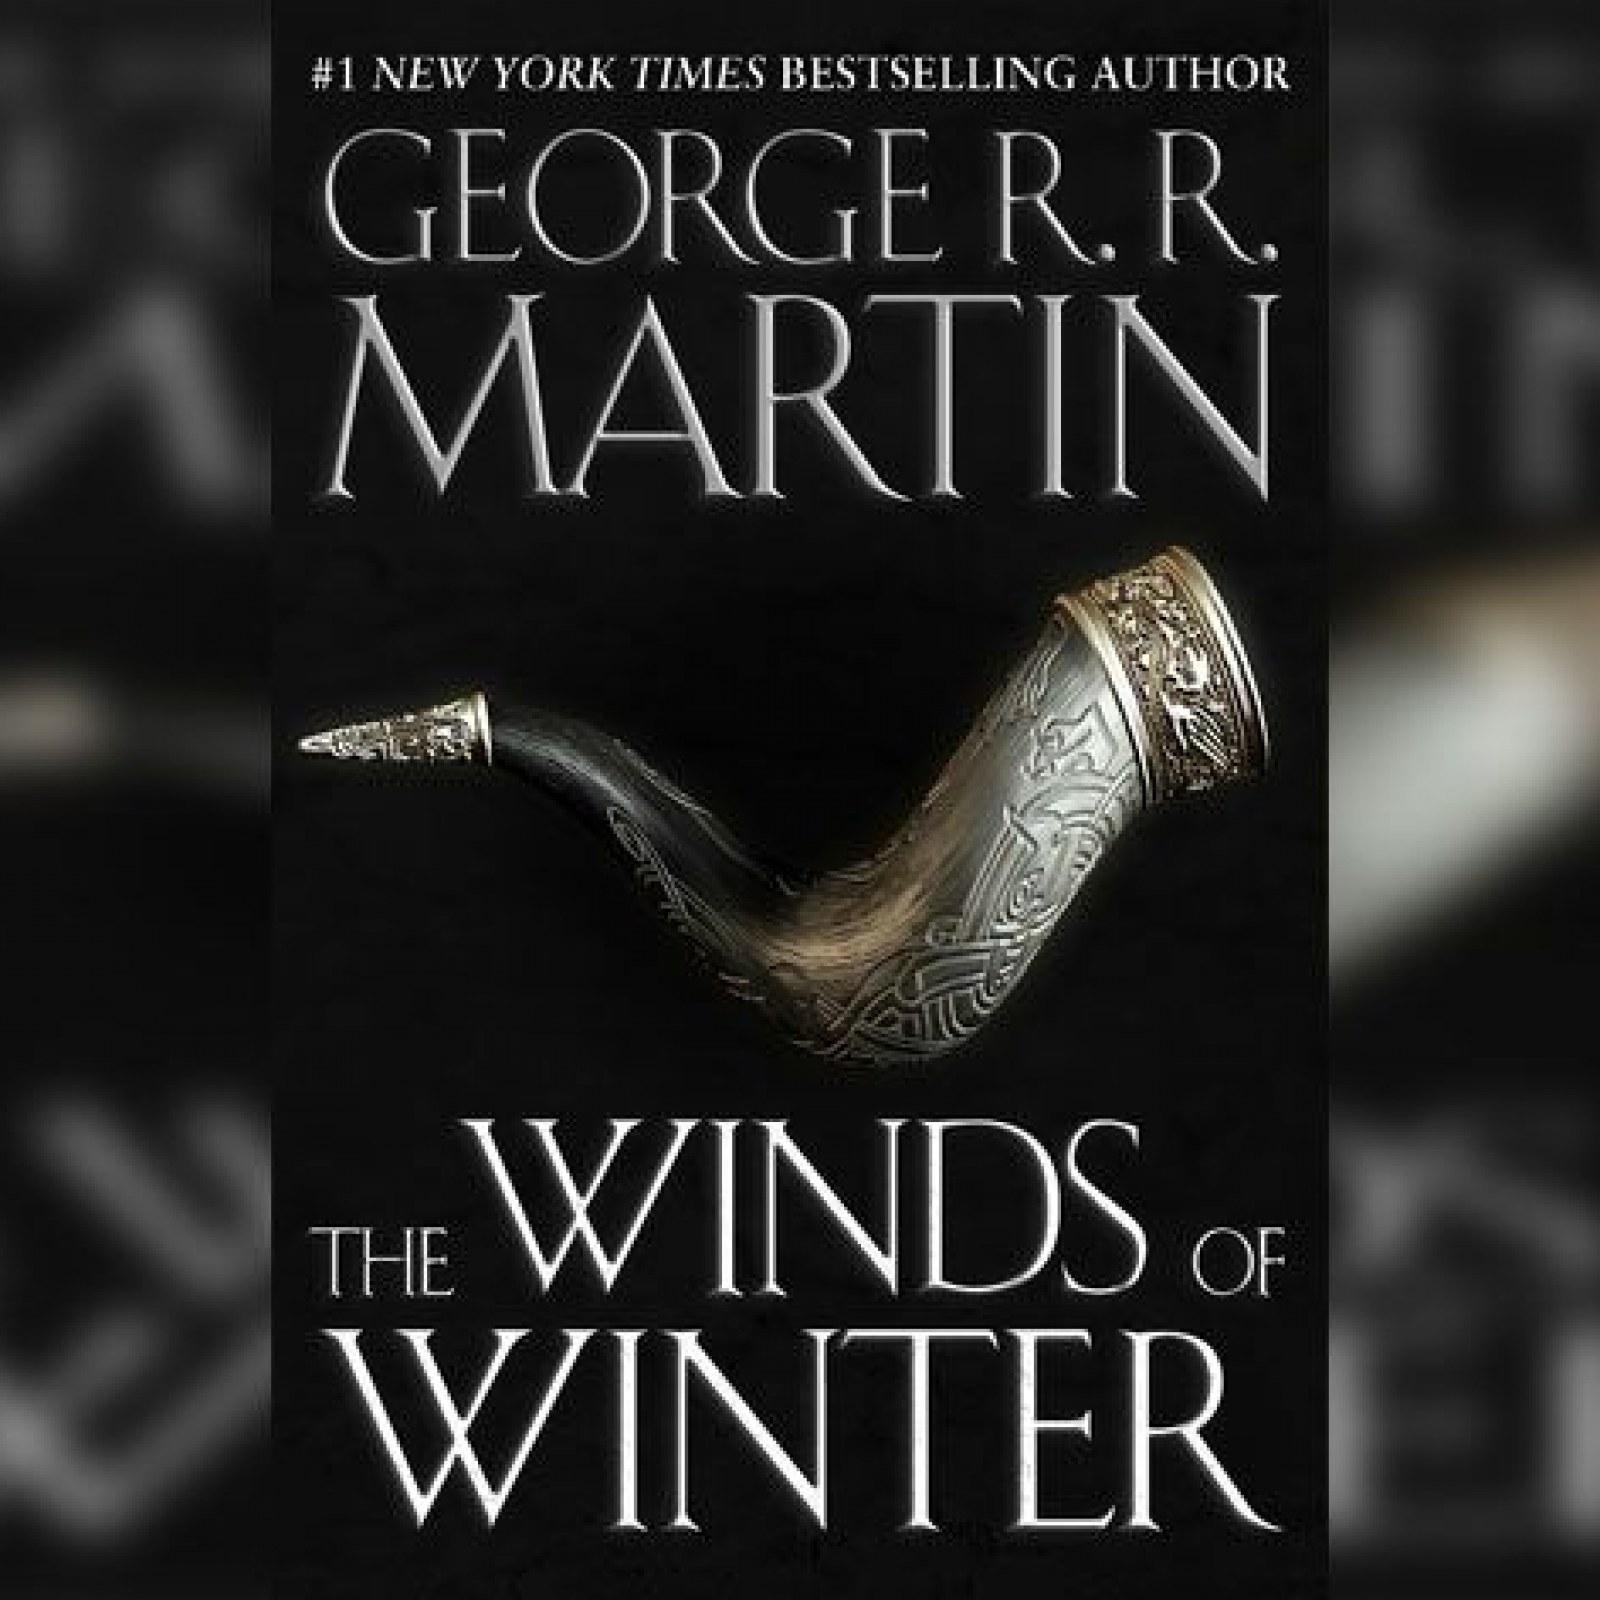 georgerrmartin winds winter